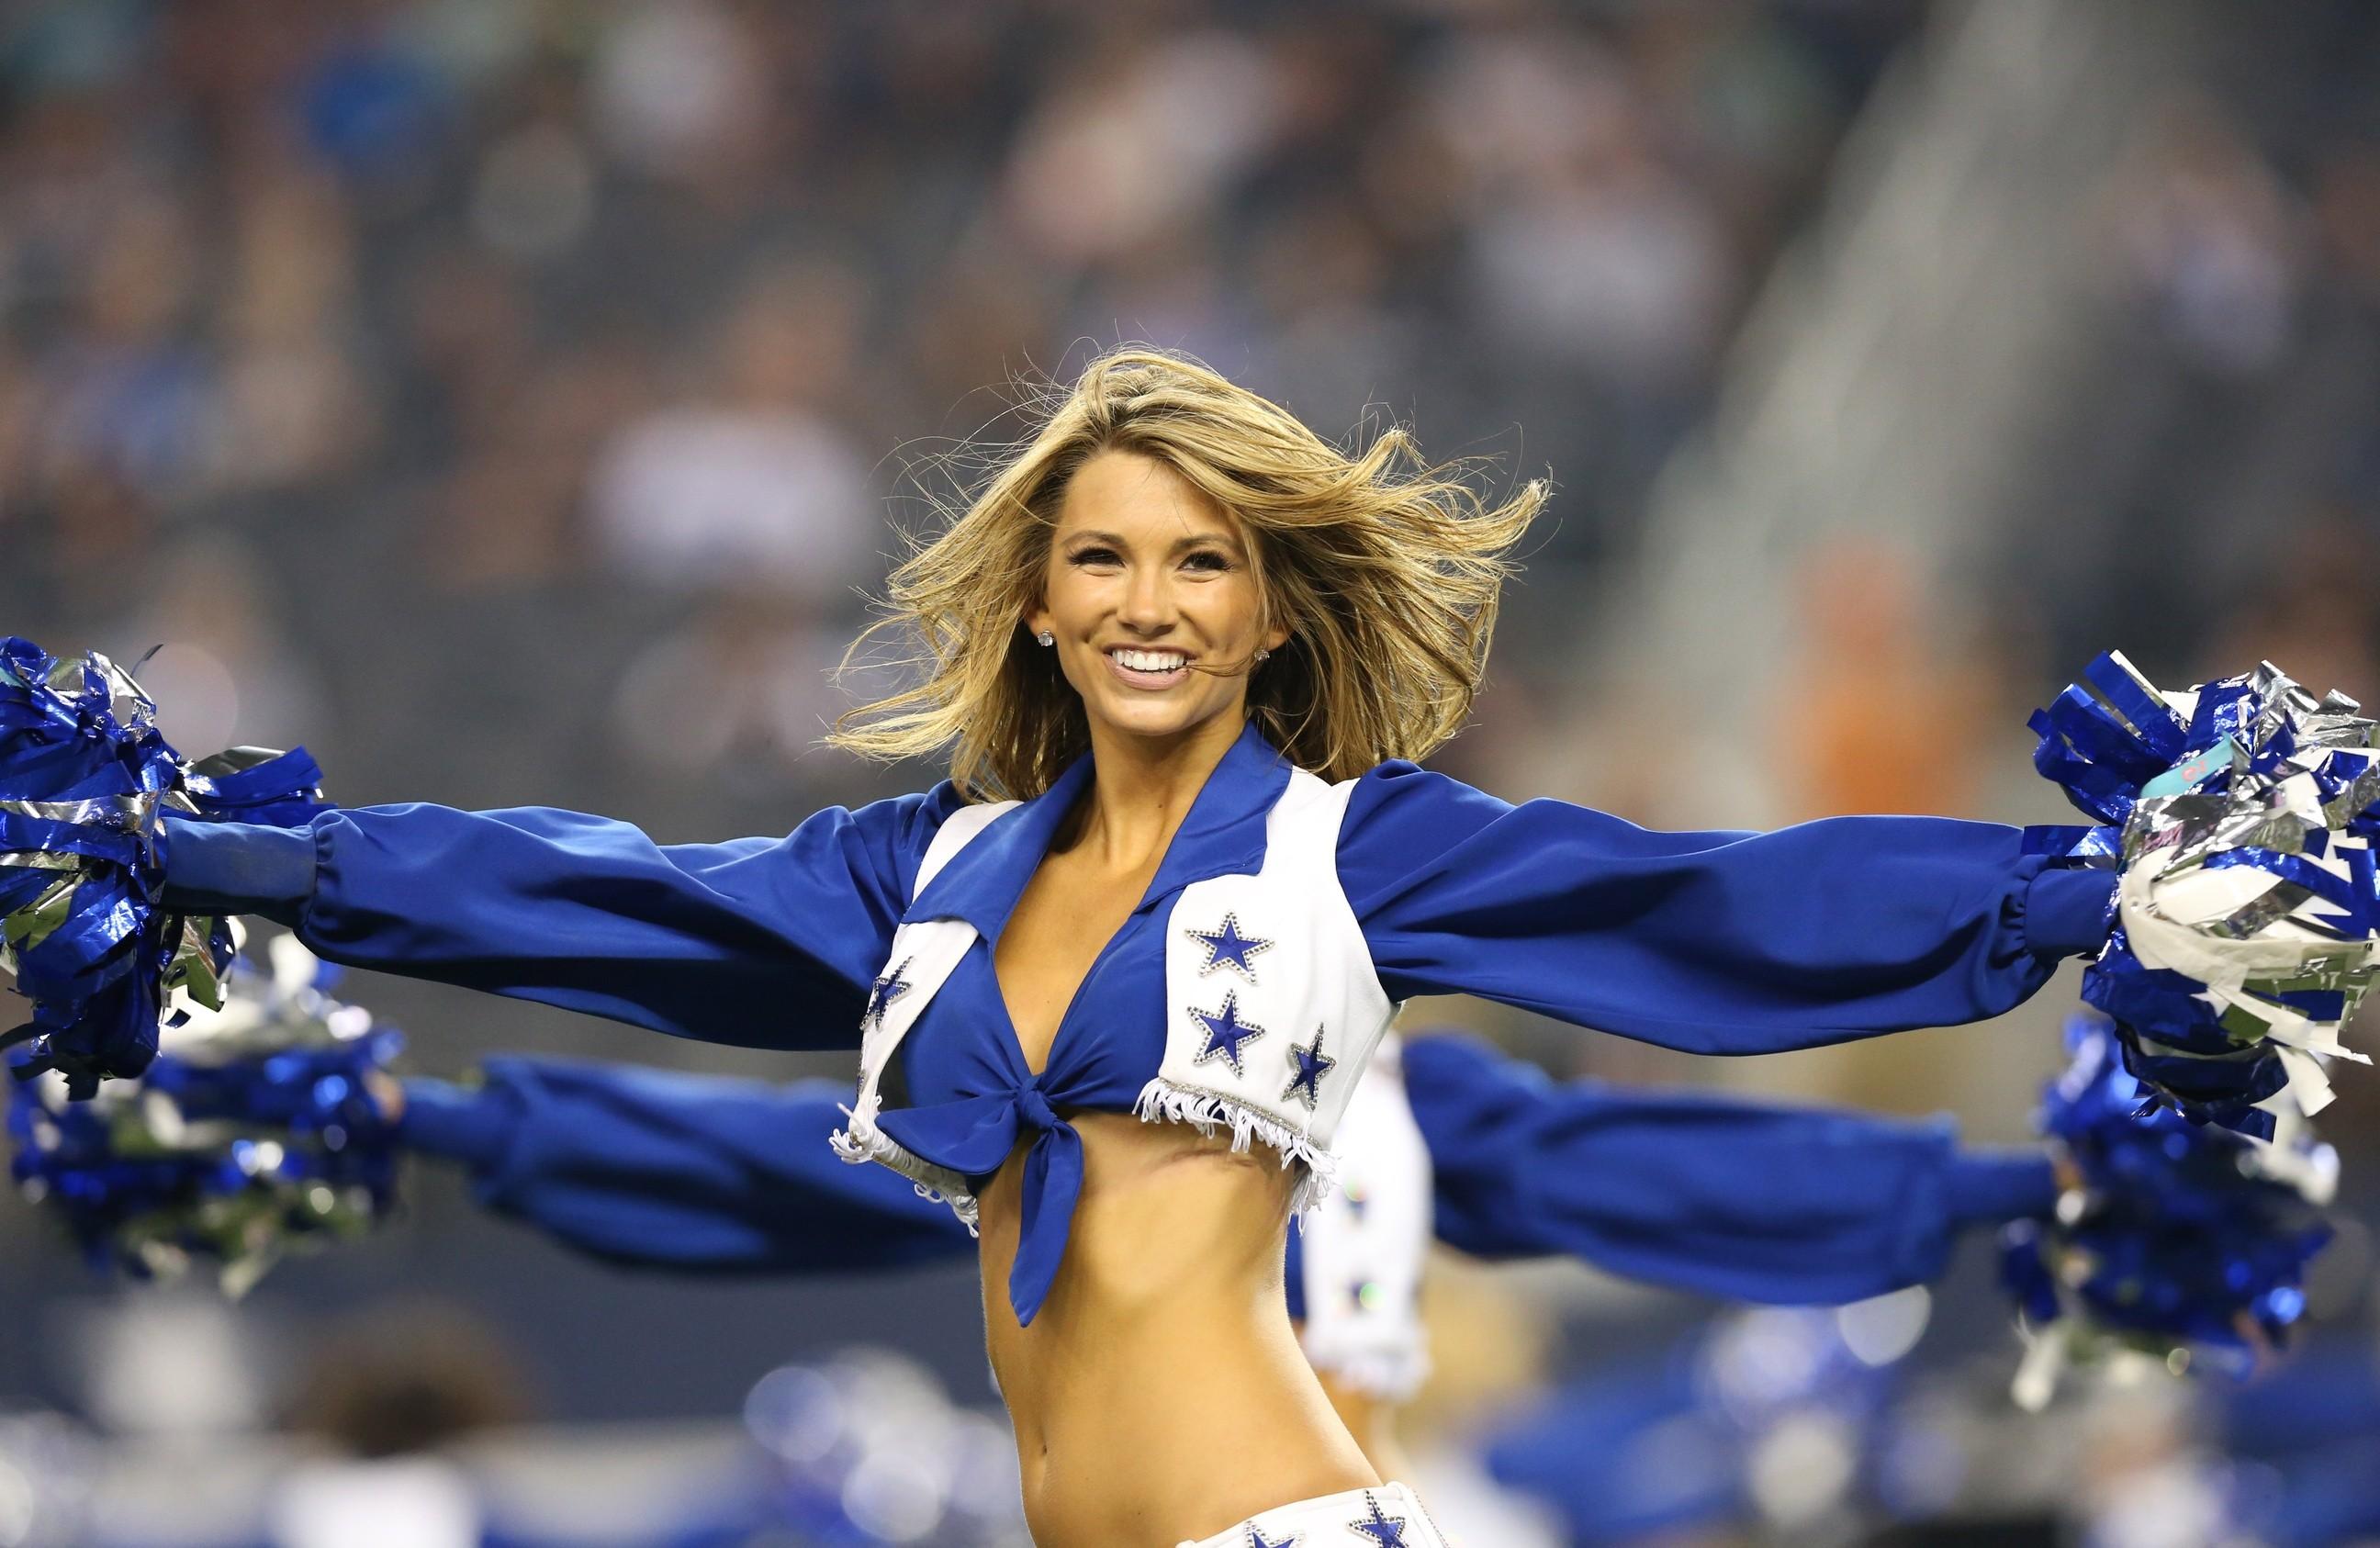 Sexiest Dallas Cowboys Cheerleader   Cheerleader Photo of the Day 8/27/2013: